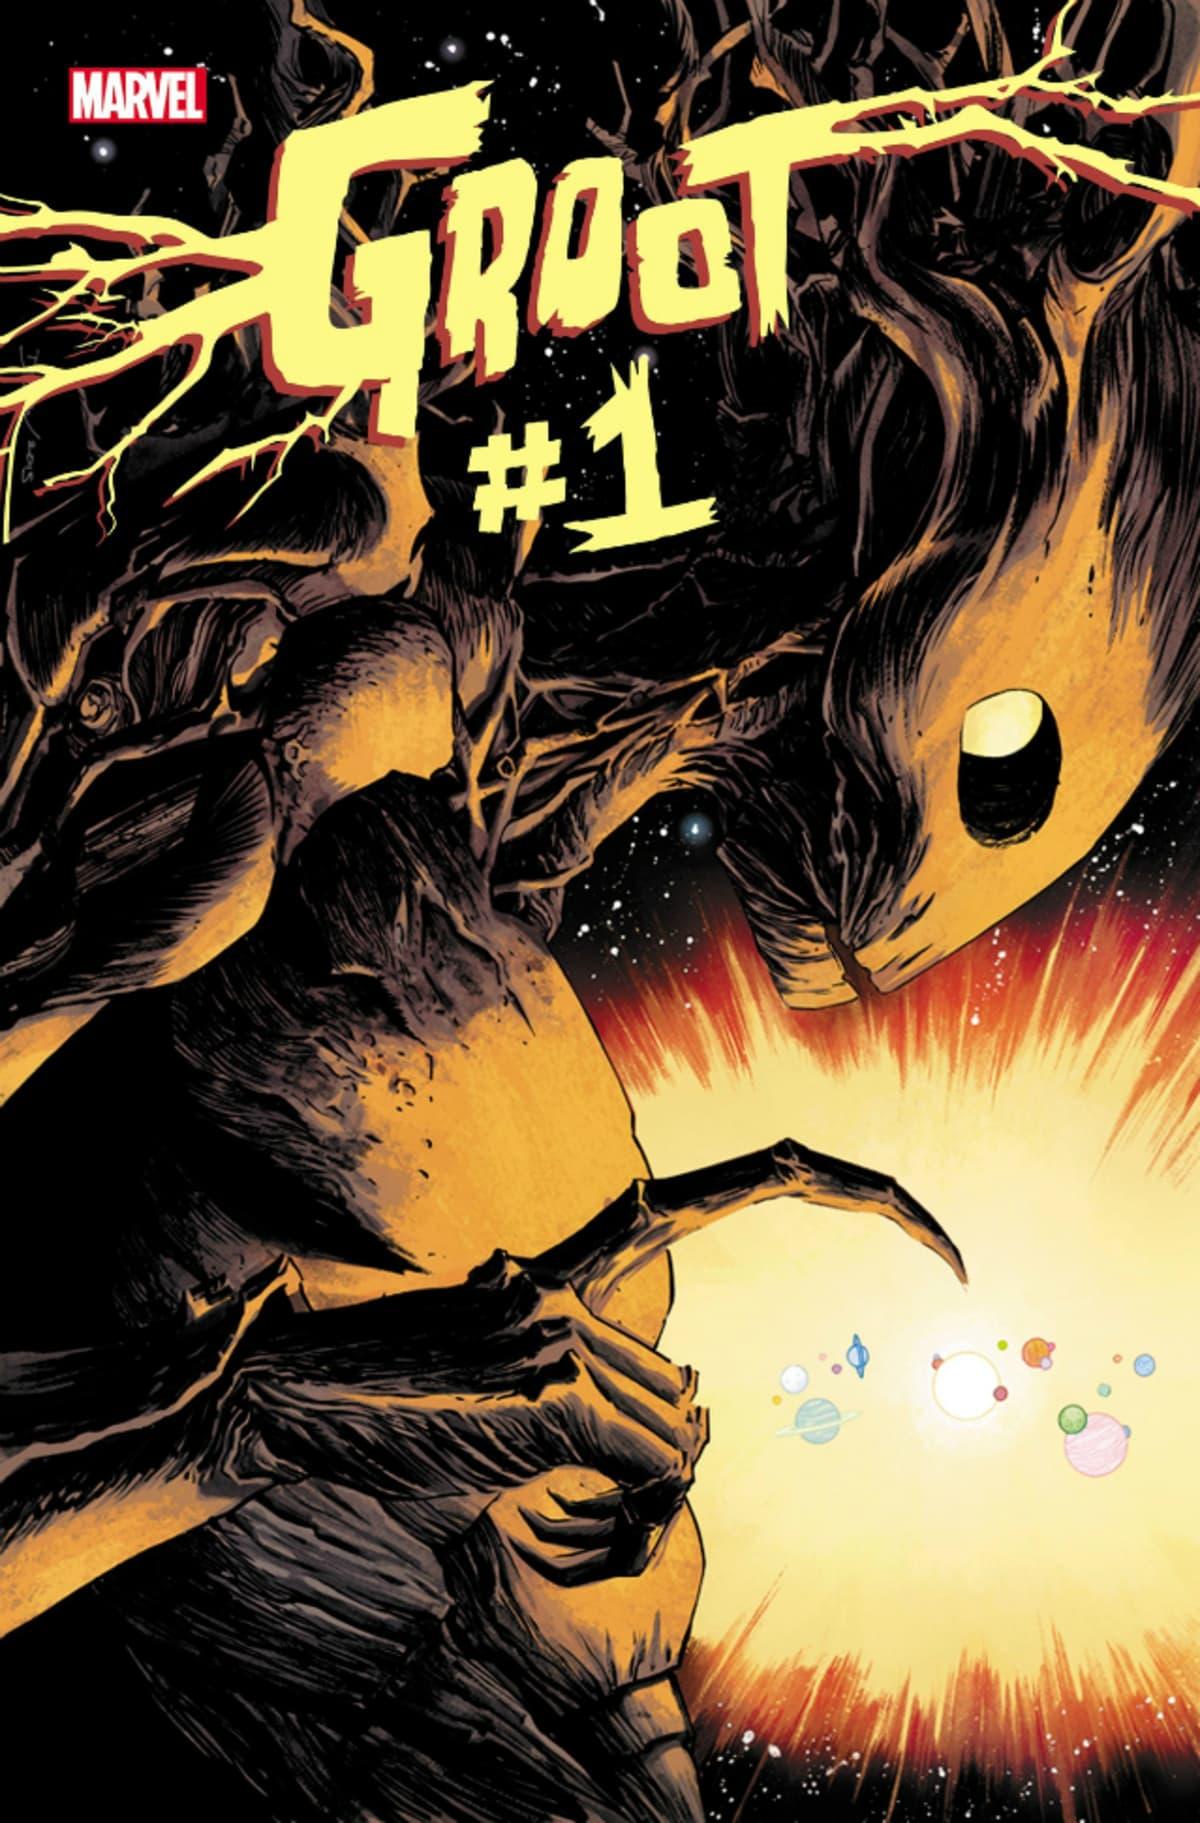 Groot is Getting His Own Comic